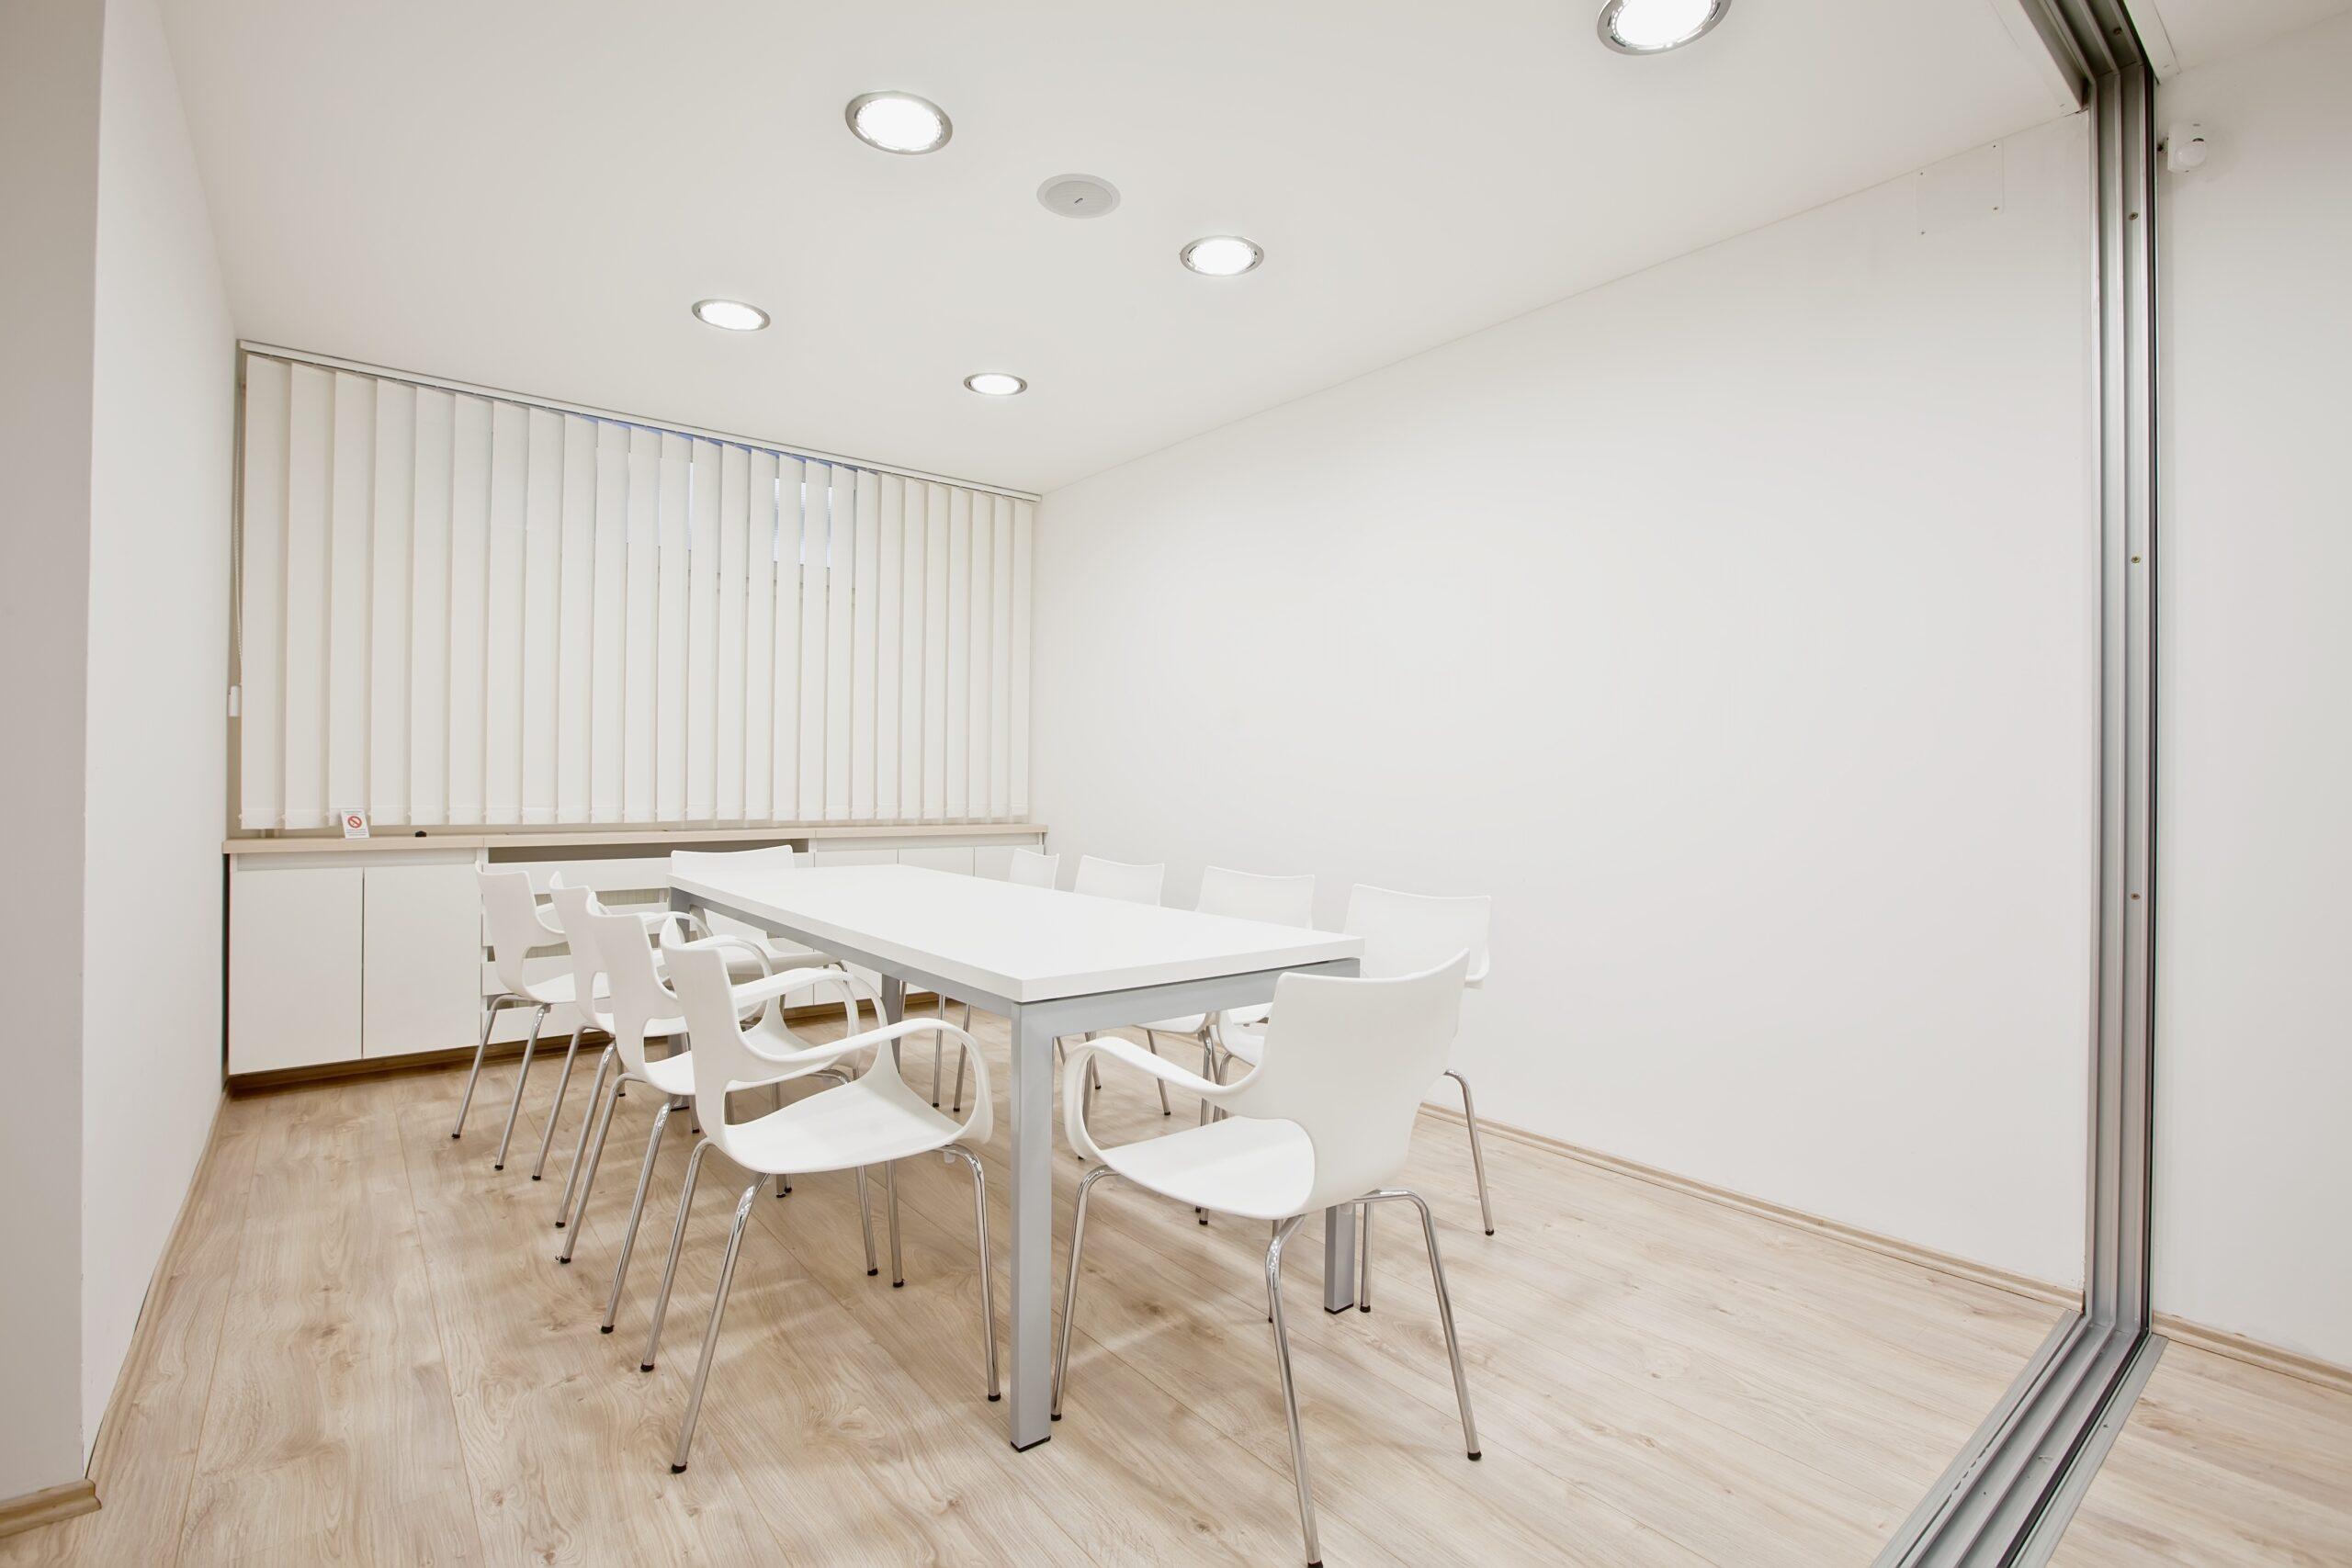 Hochwertiger Sonnenschutz, Sichtschutz und Lichtschutz - Lamellenvorhang - Senkrechtlamellen - Lamellenvorhang im Besprechungsraum - Dr. Haller + Co. - Selastore®